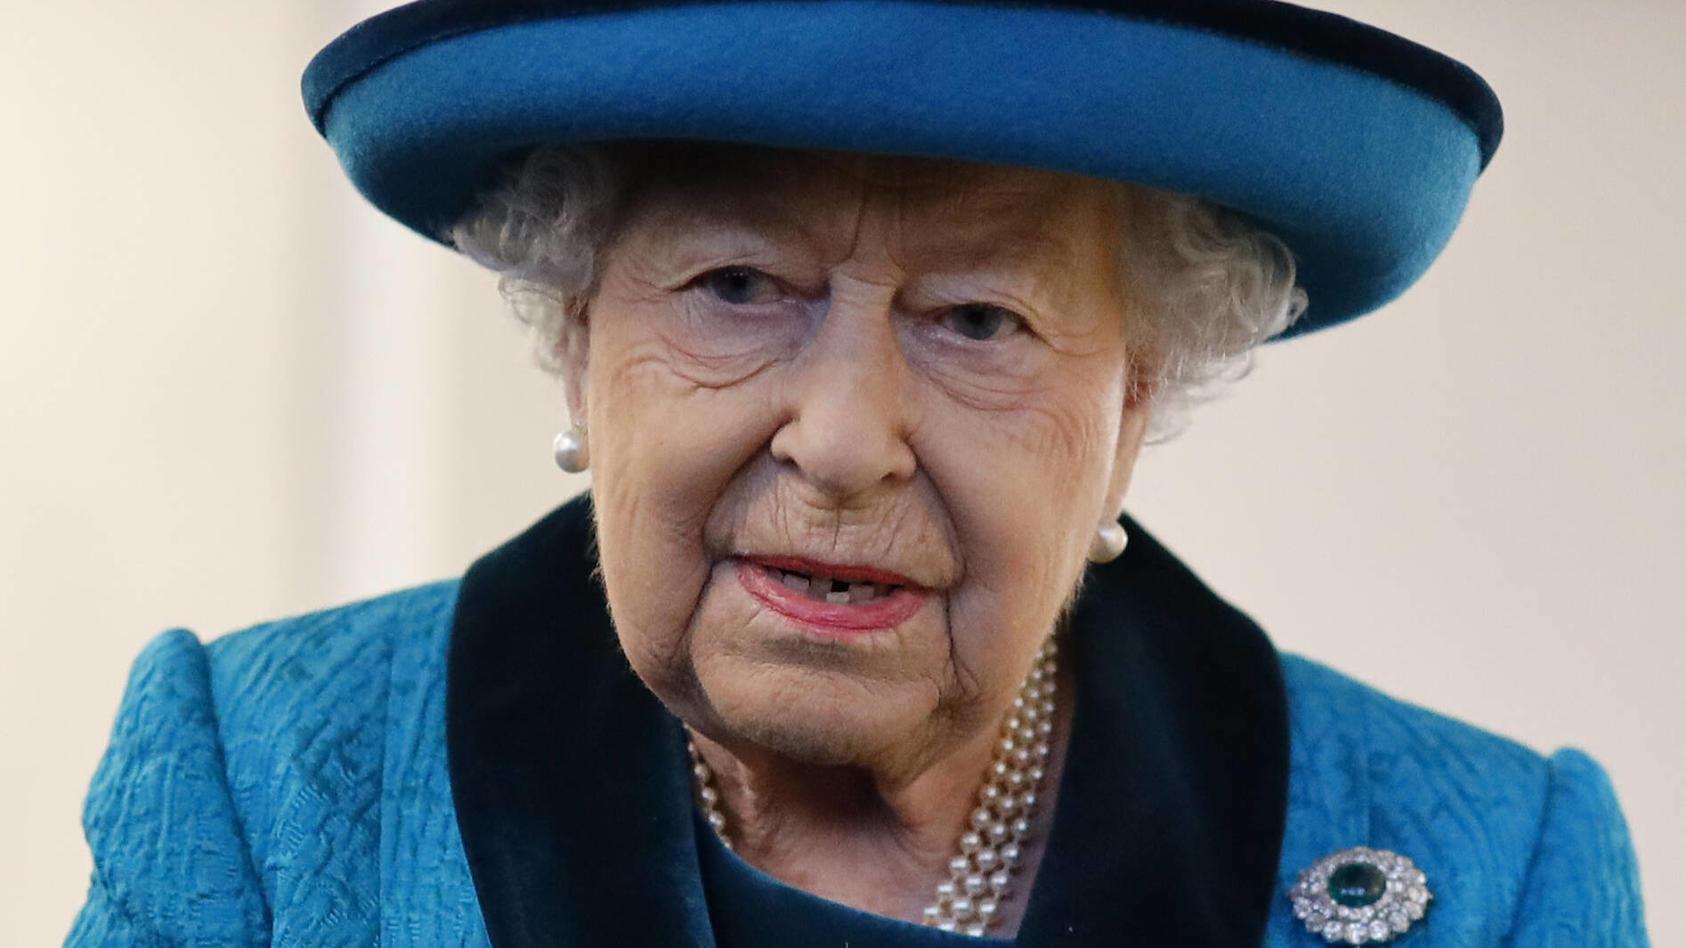 Entertainment Bilder des Tages . 26/11/2019. London, United Kingdom. Queen Elizabeth II during a visit to the Royal Phi